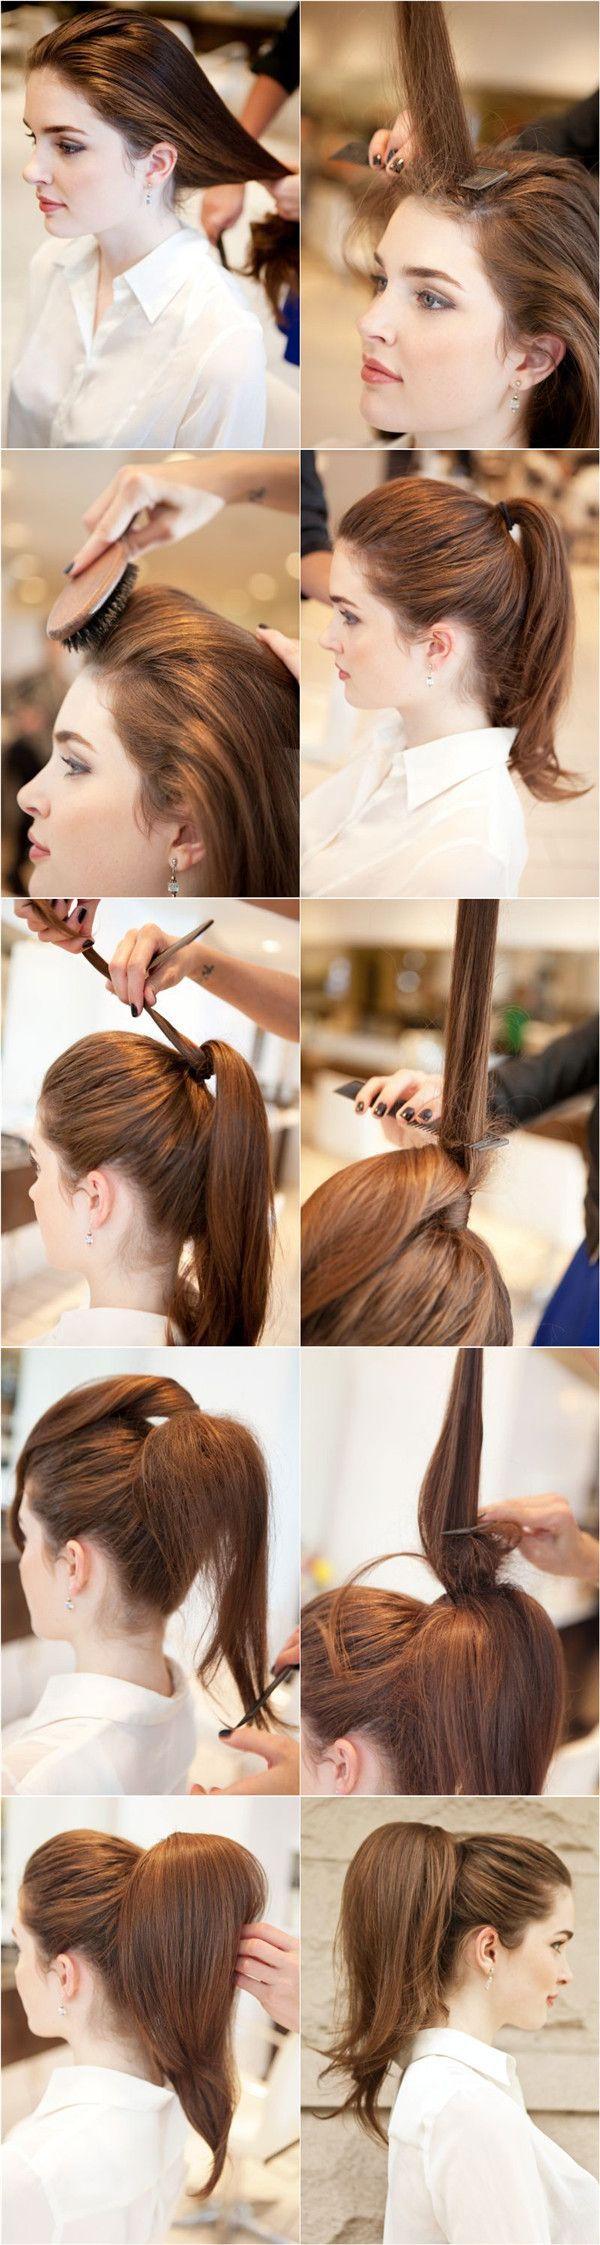 Queue de cheval glamour Coiffure Coiffure, Cheveux